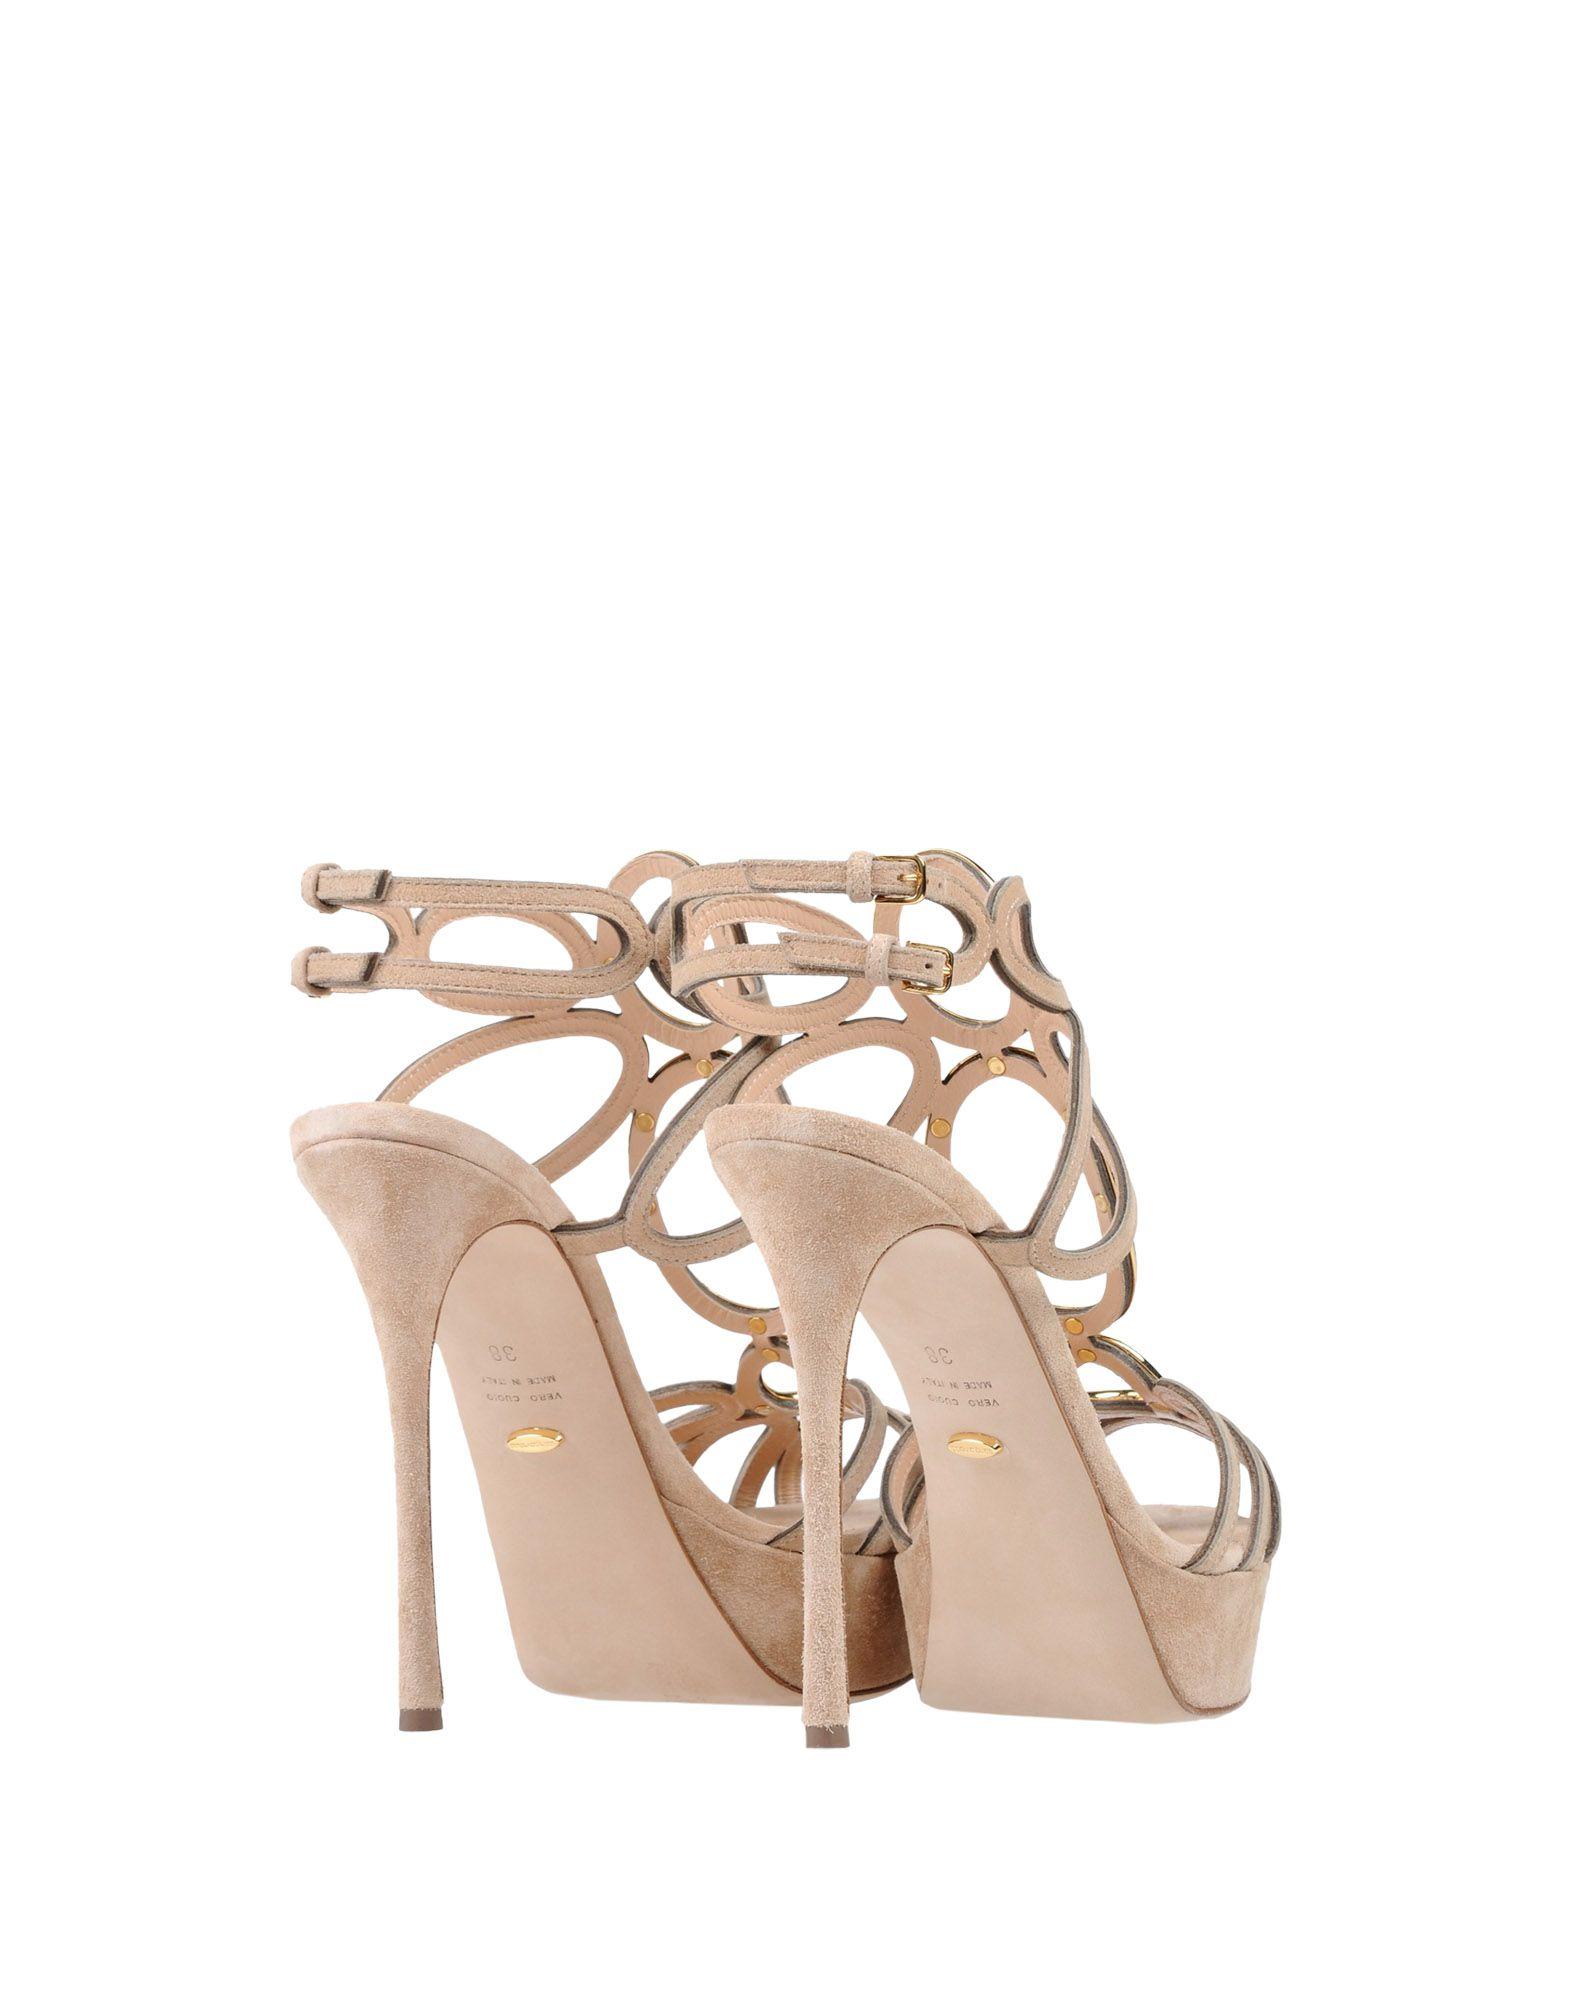 Rabatt Schuhe Sergio Rossi Sandalen 11358204TR Damen  11358204TR Sandalen 6c365d